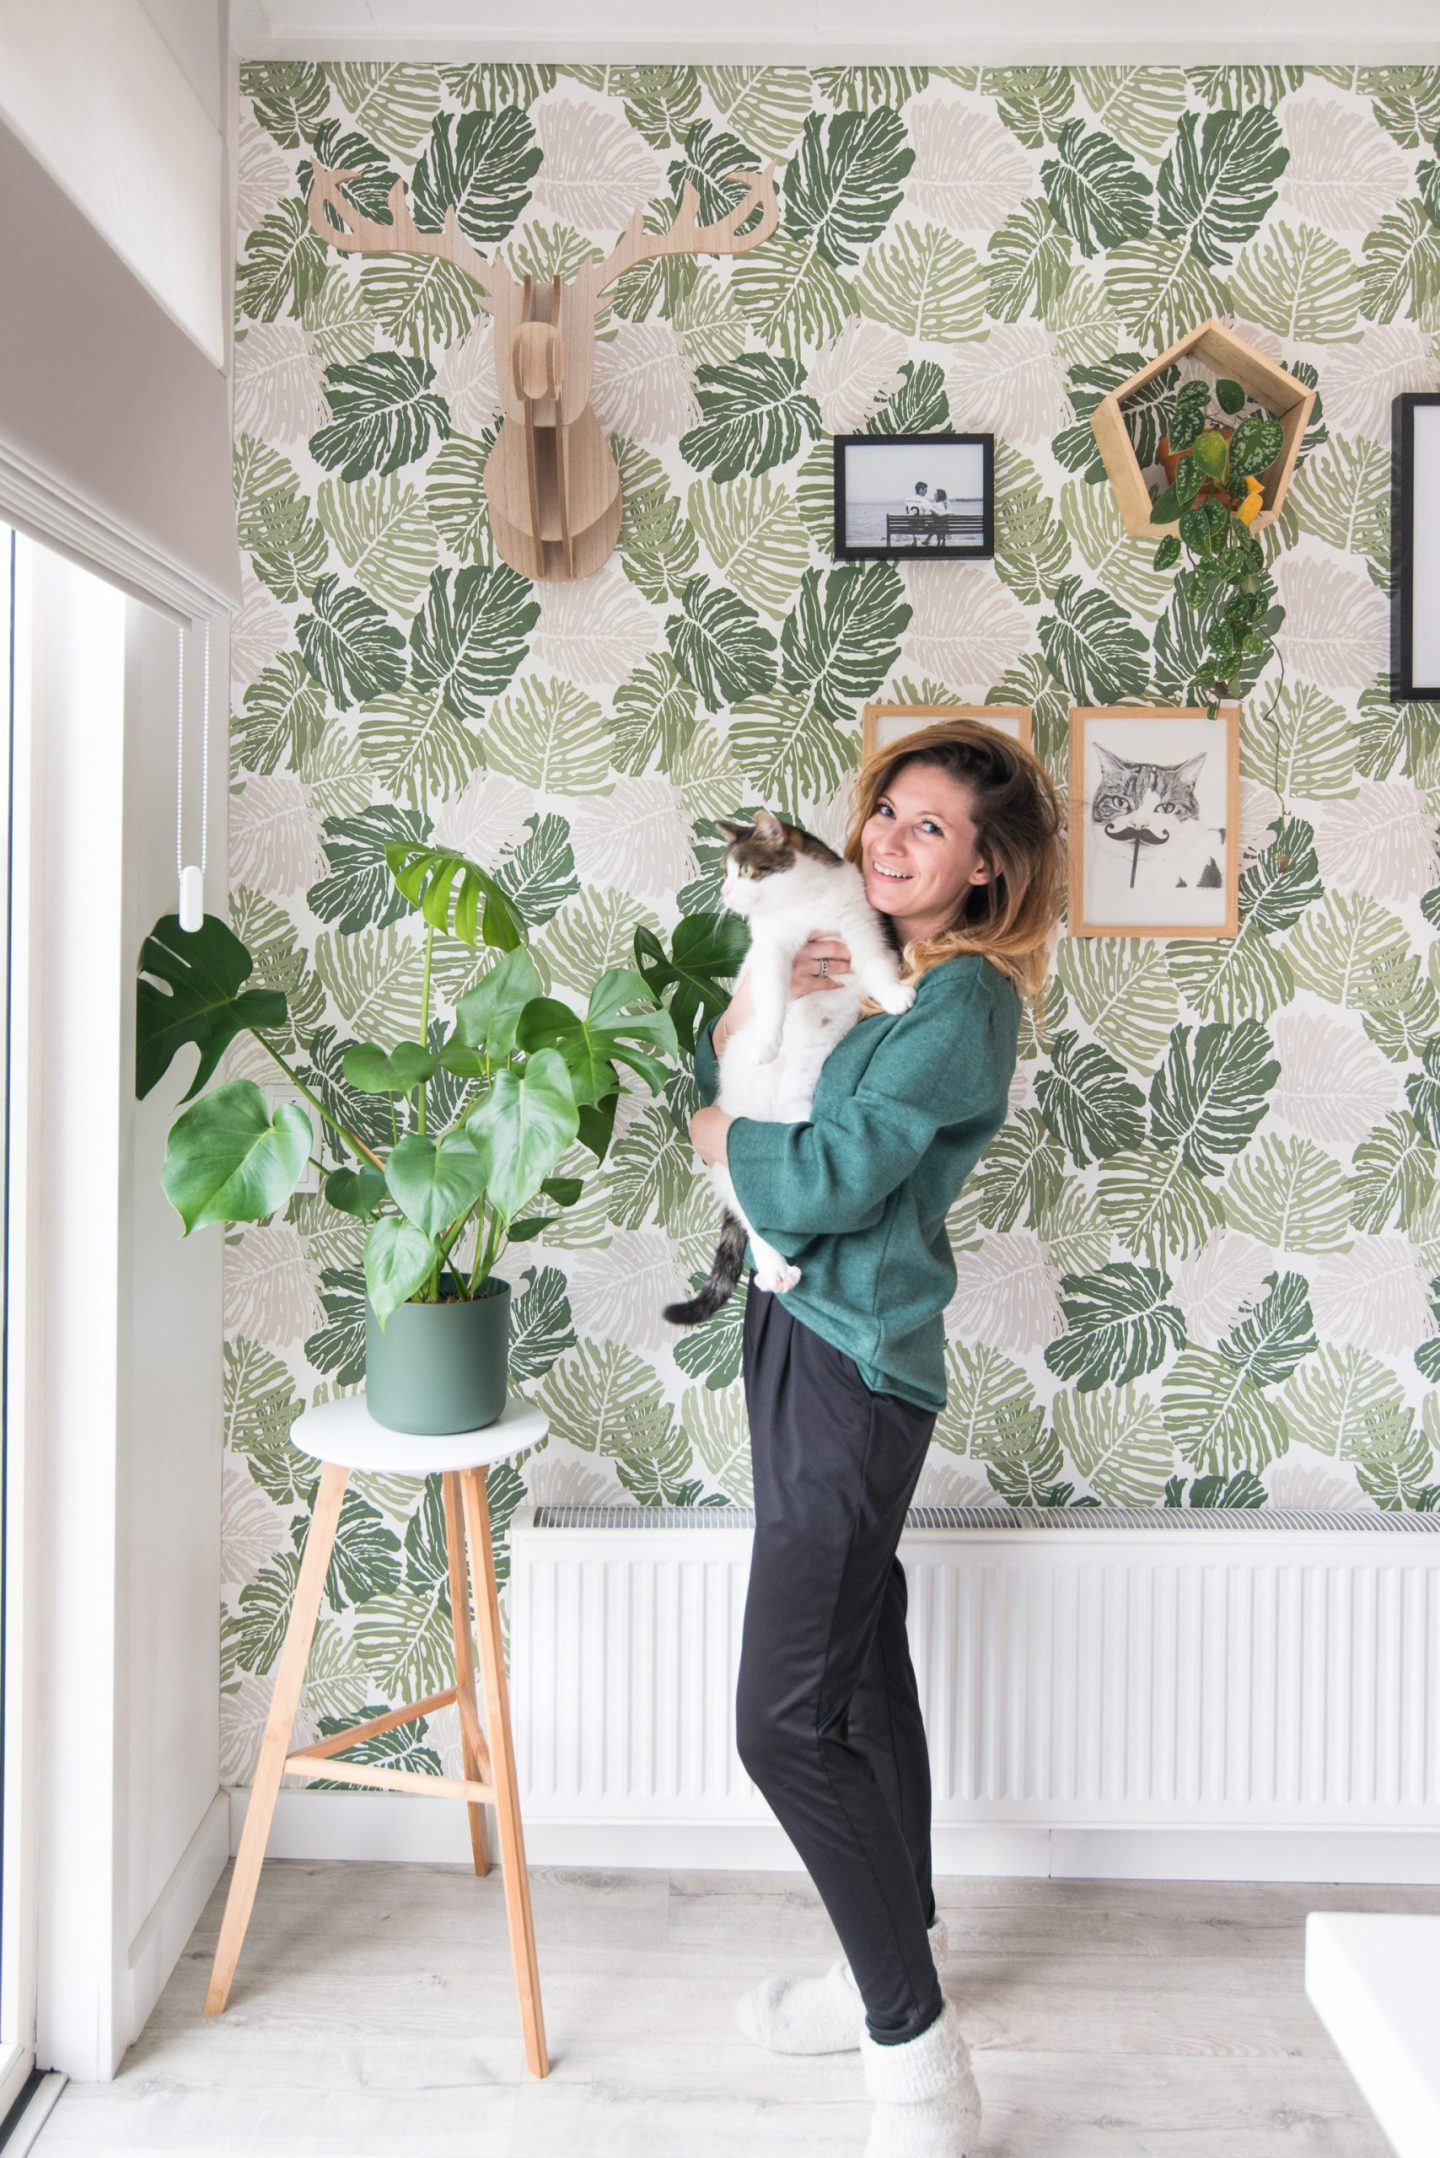 keeelly91 plantenbehang plantlover urbanjungle interieurinspiratie interieur wooninspiratie groen wit catlover blogger